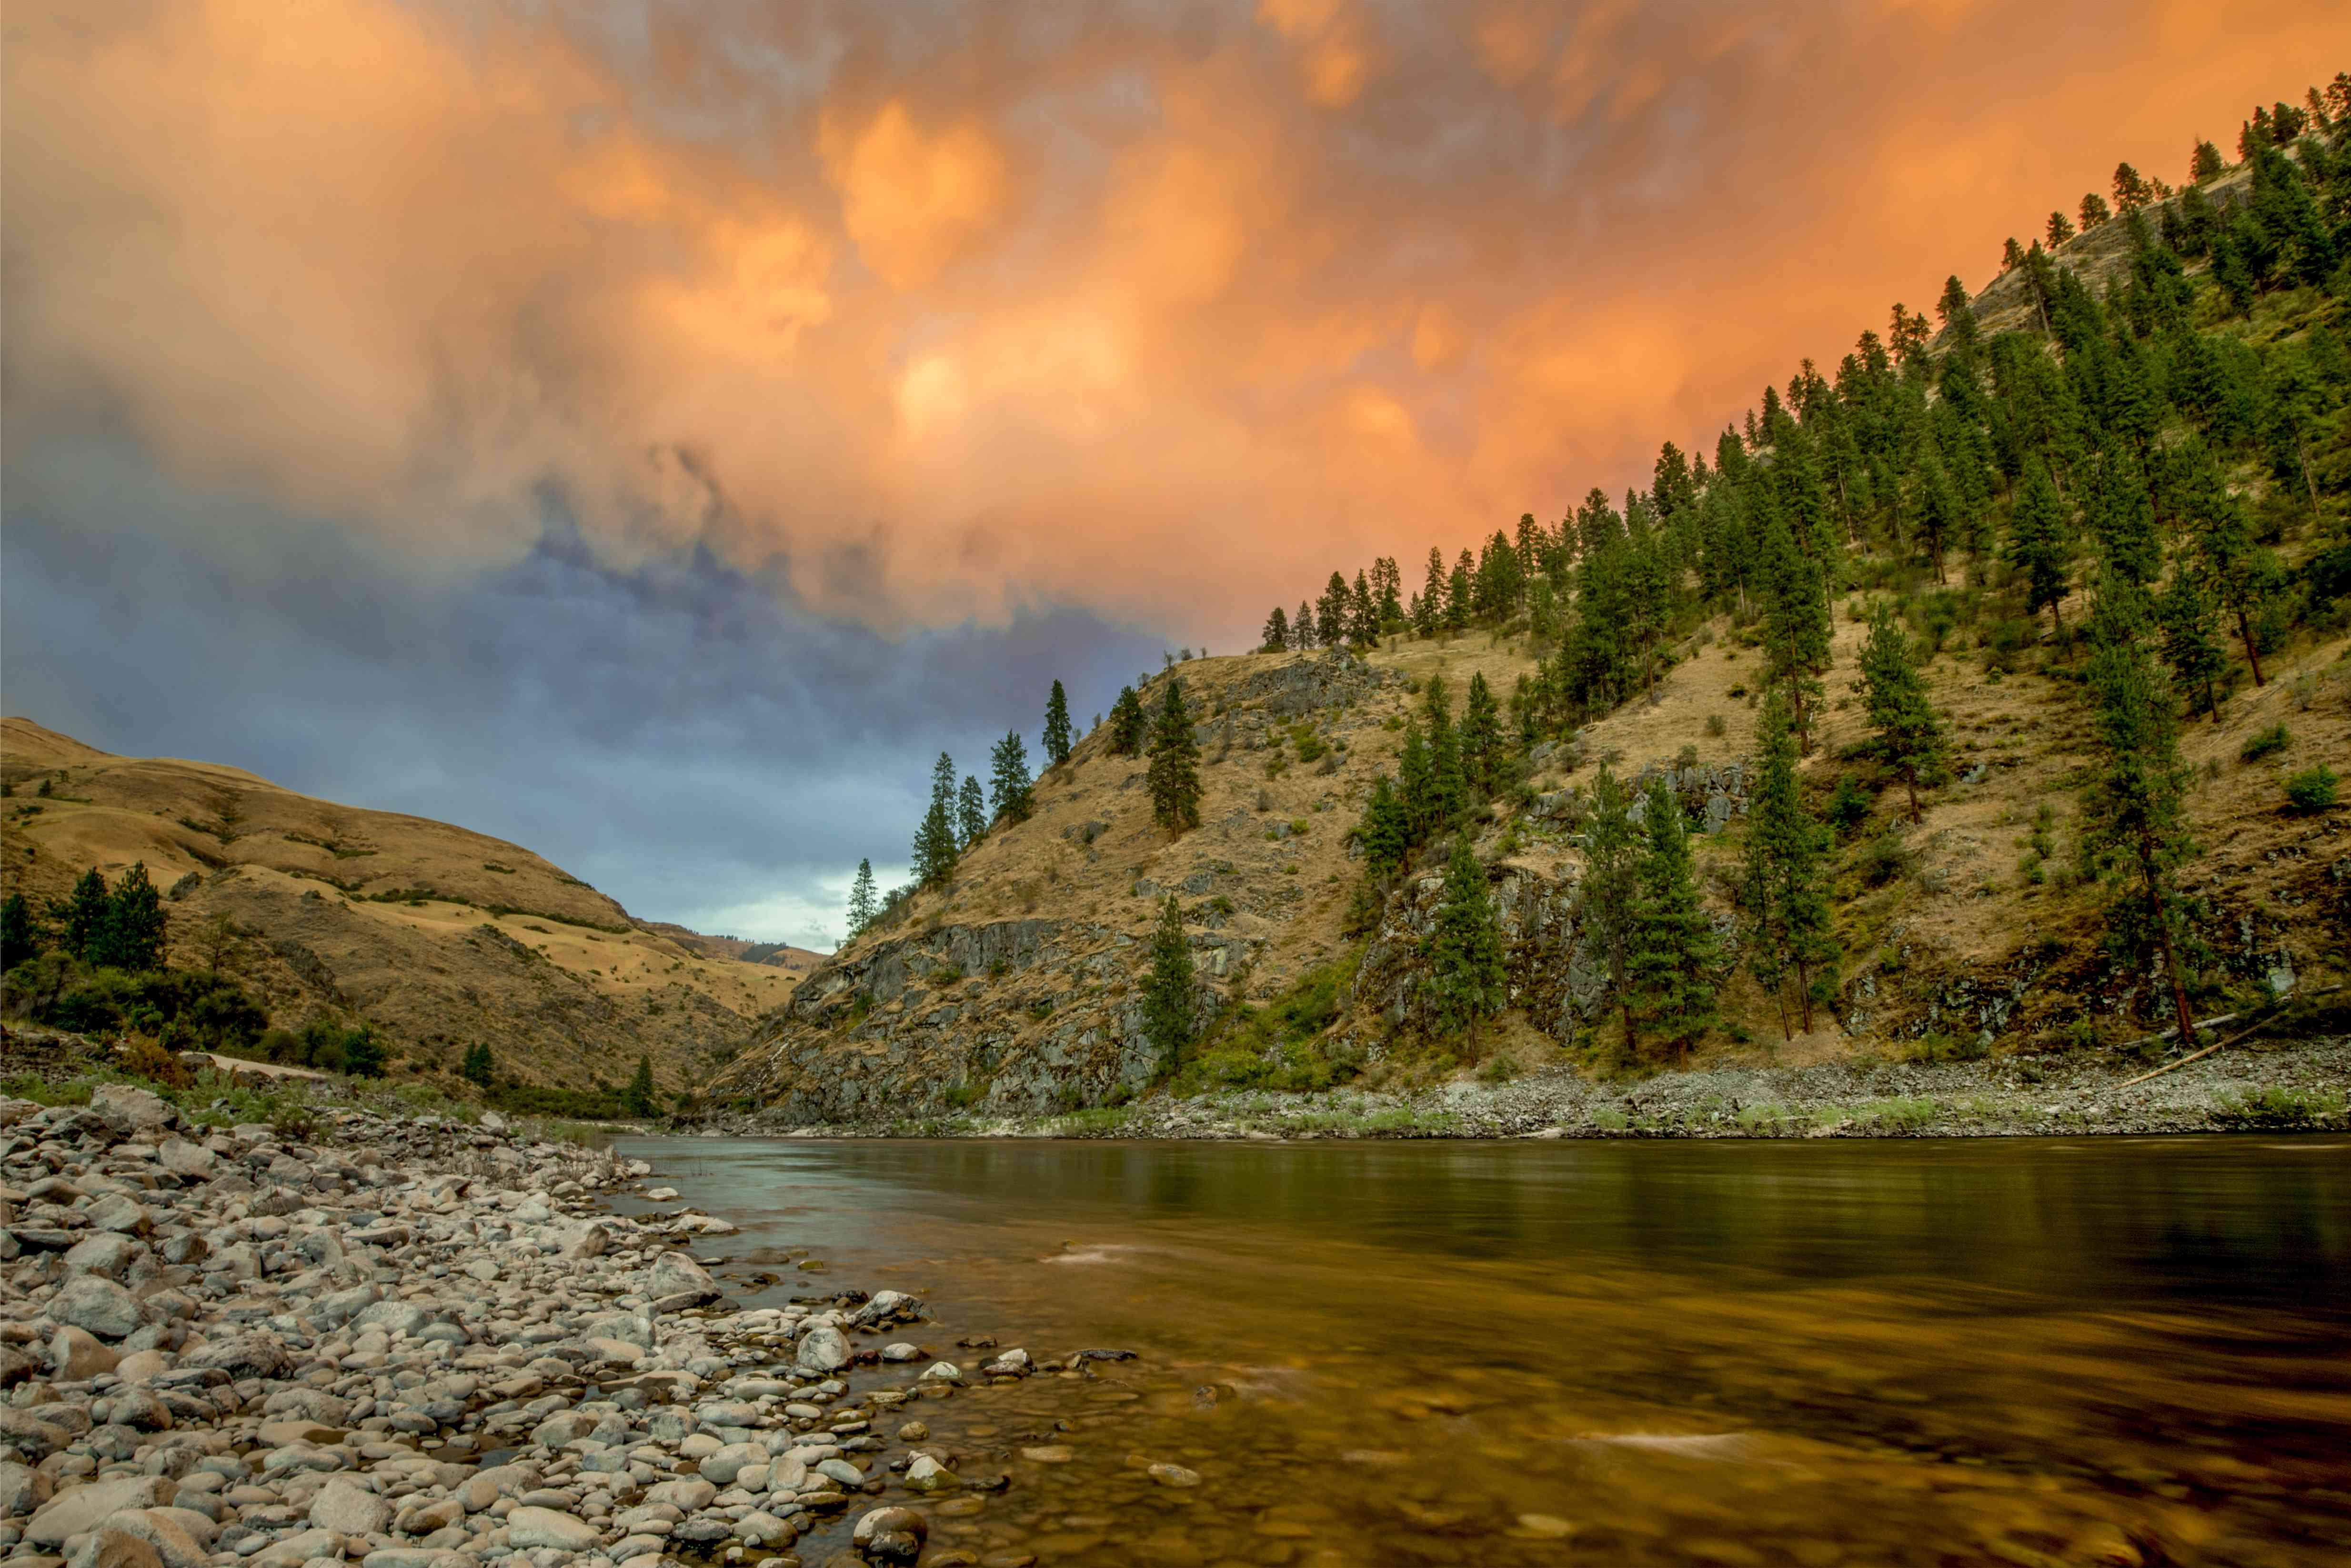 Sunset, Lower Salmon River, Idaho